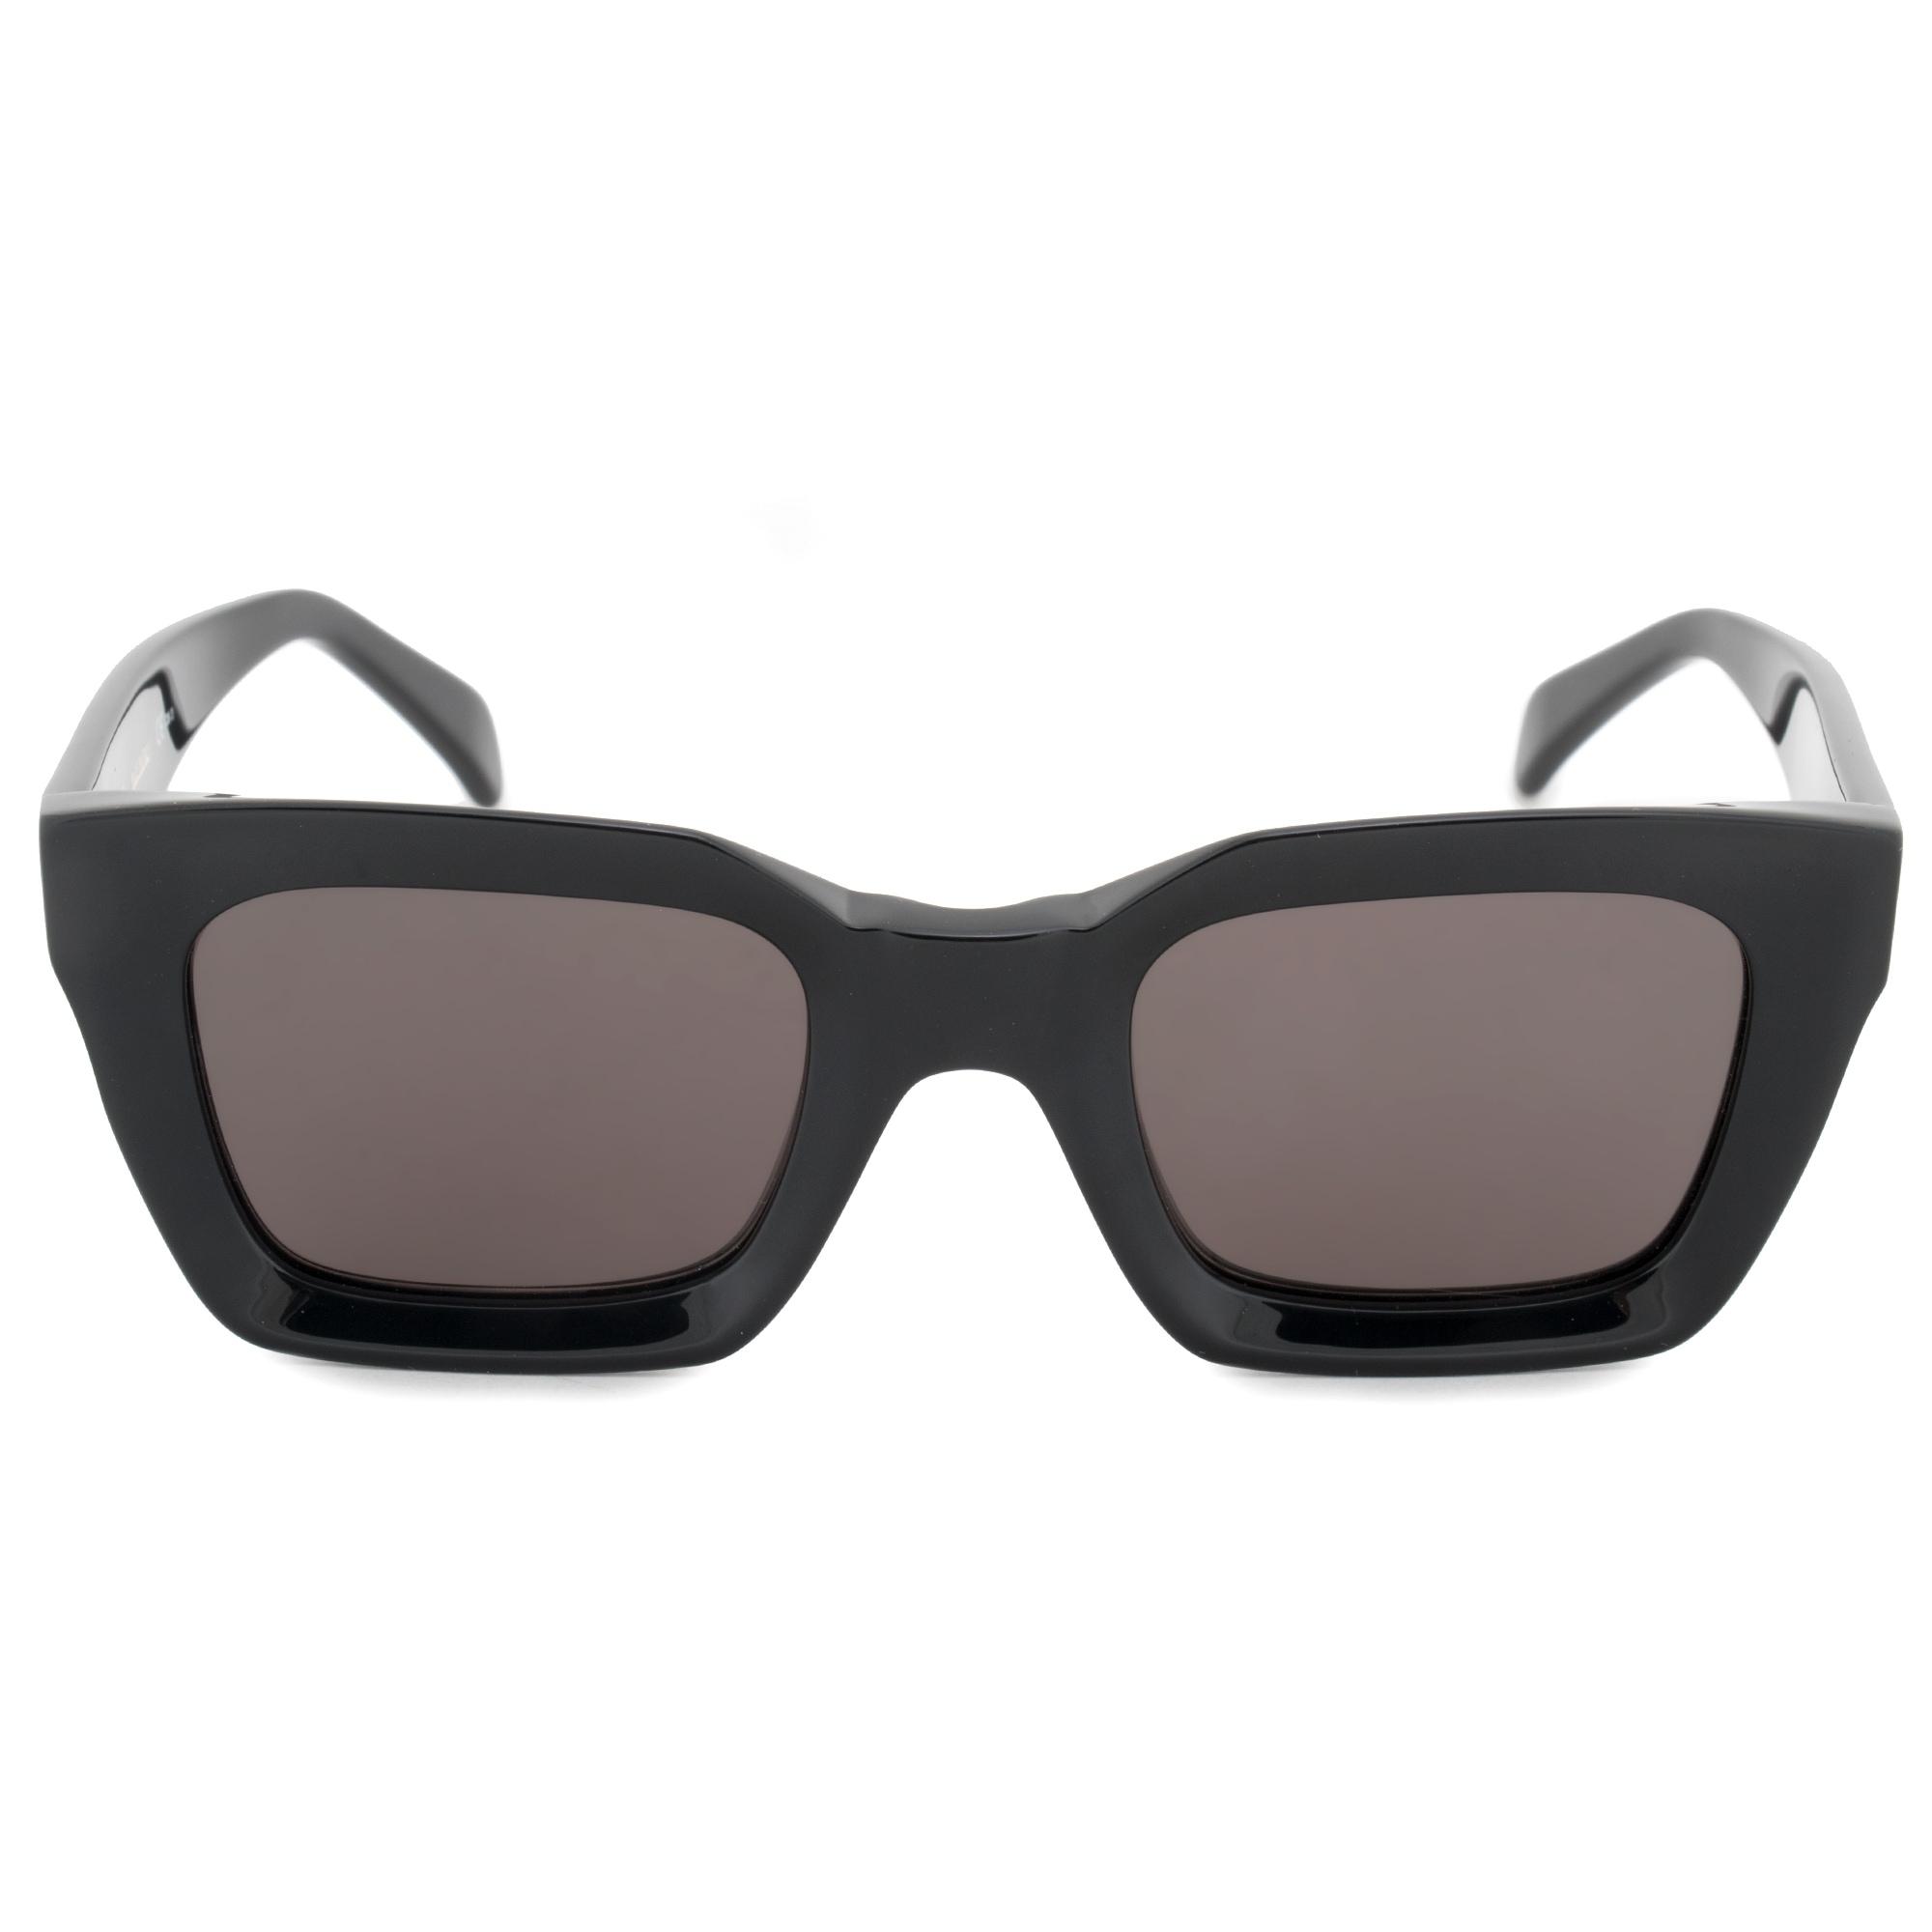 05228db40f8e Celine Women s Sunglasses